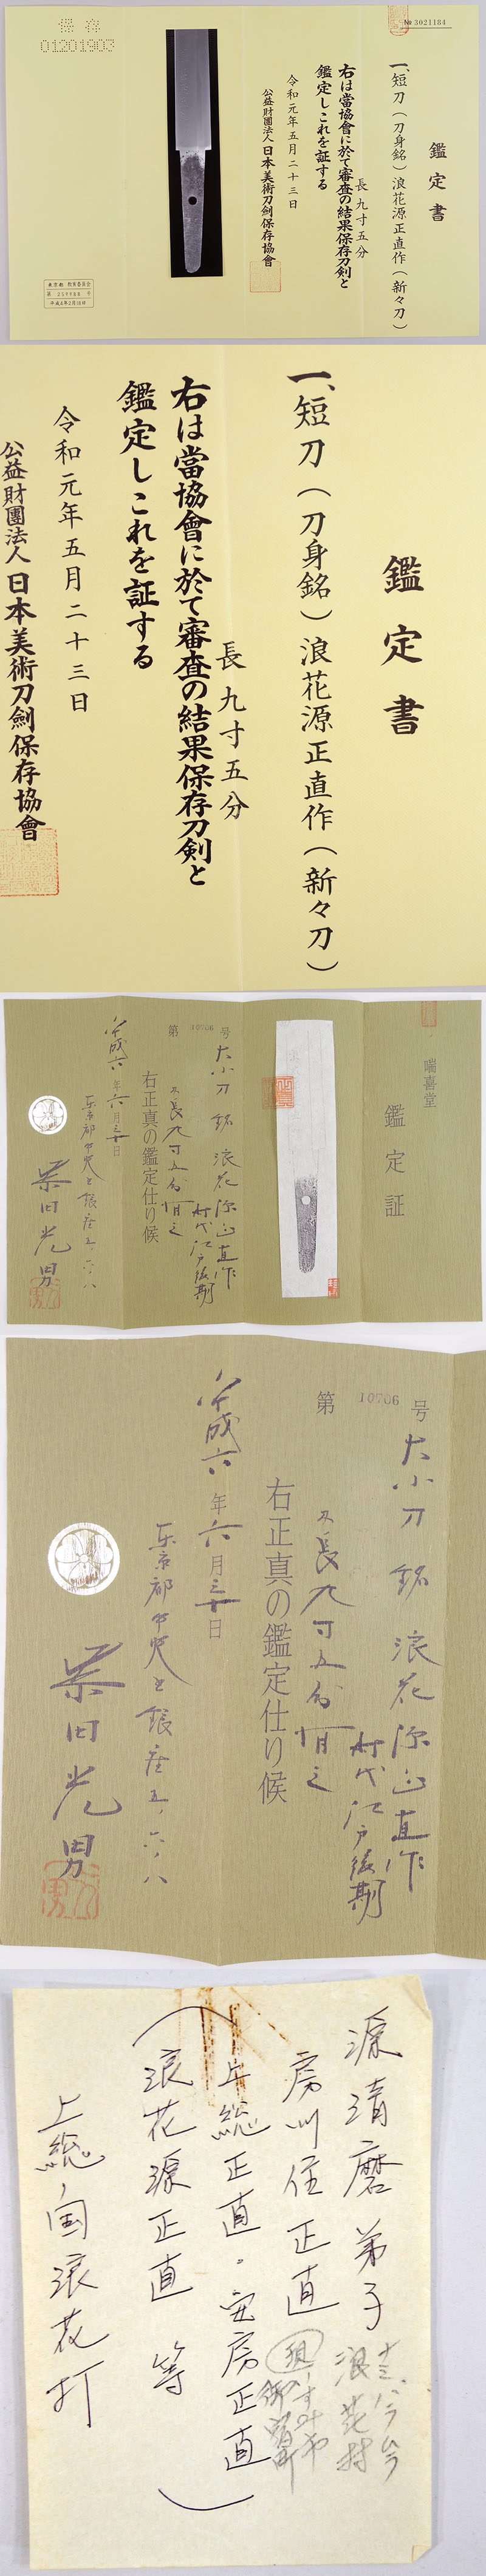 浪花源正直作(清麿の門人) Picture of Certificate